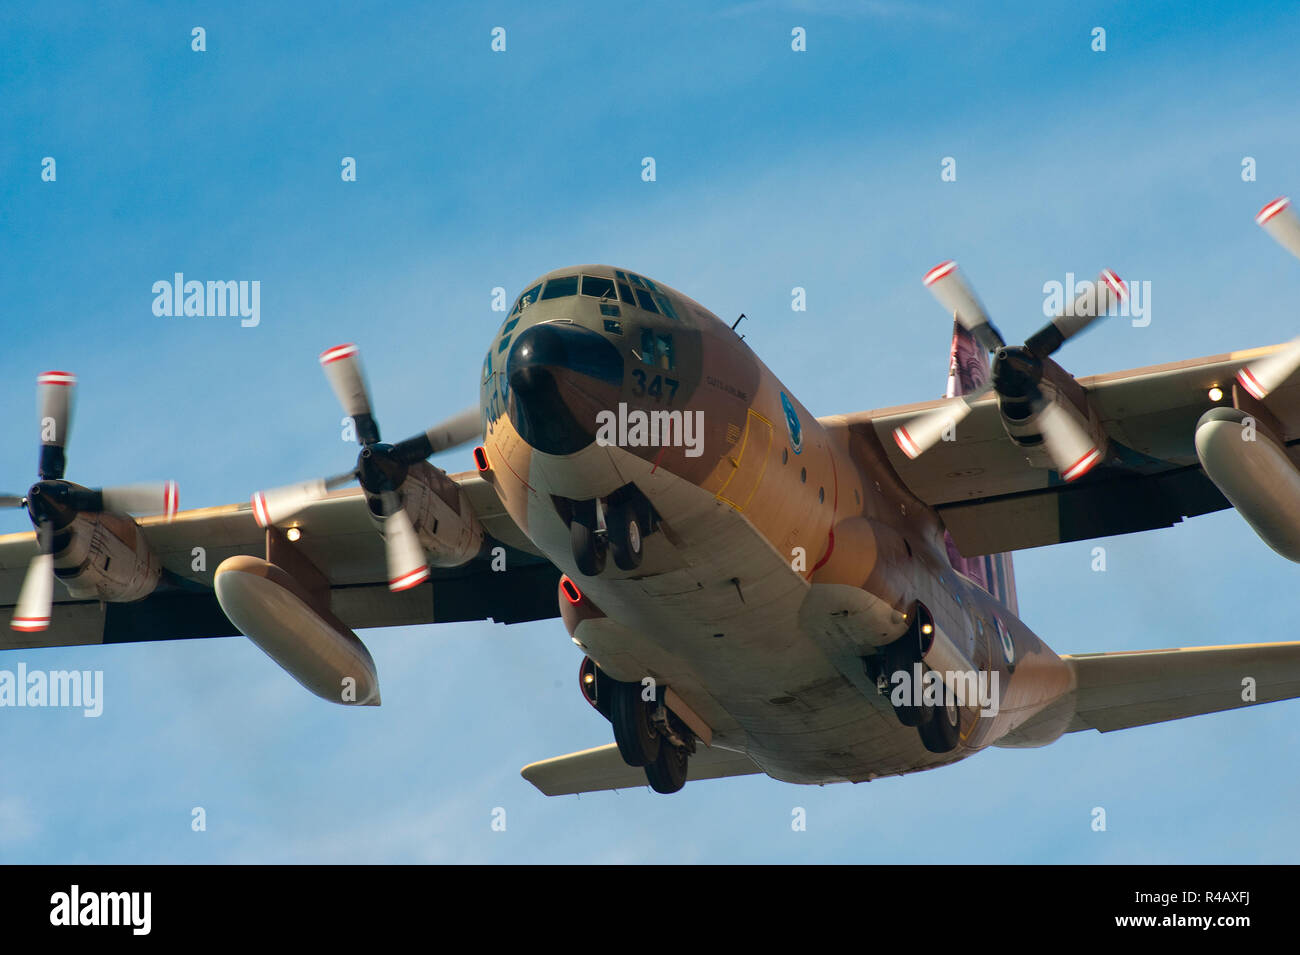 C-130 Hercules, military airplane, Royal Jordanian Navy, airshow, transportation airplane, Aqaba, Jordan, Asia - Stock Image